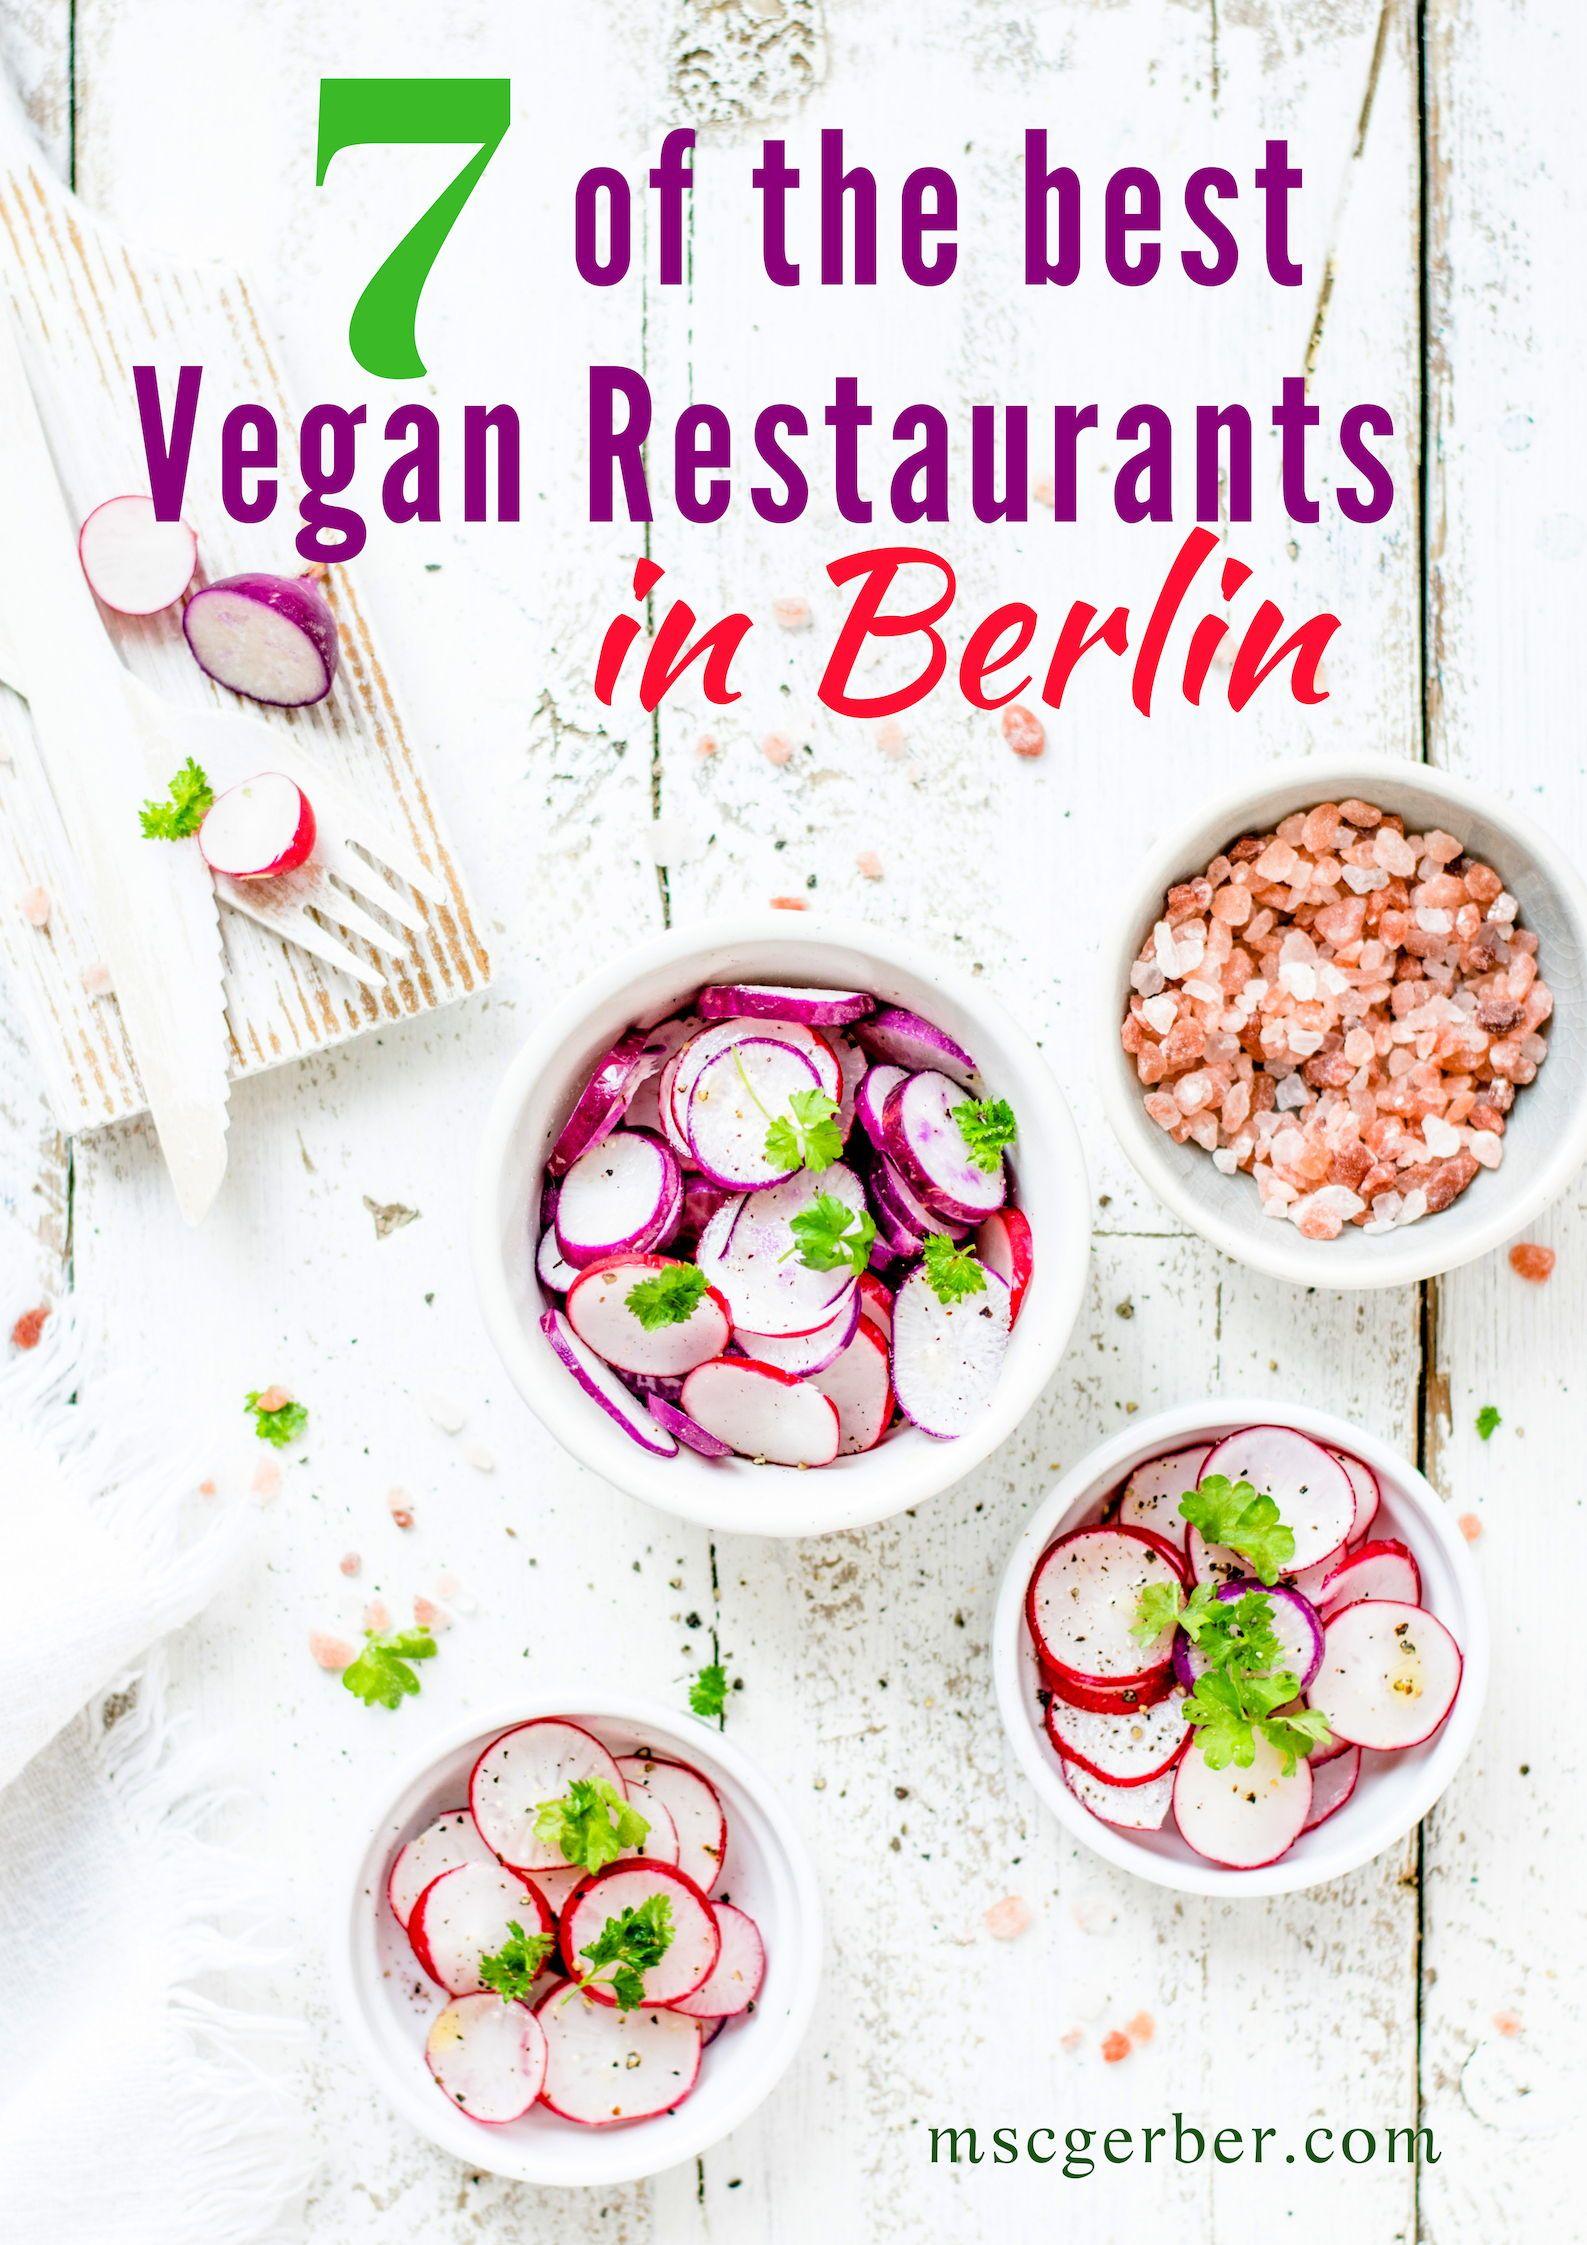 7 of the best vegan restaurants in berlin check out the best vegan restaurants vegan restaurants berlin vegan and gluten free restaurant and try